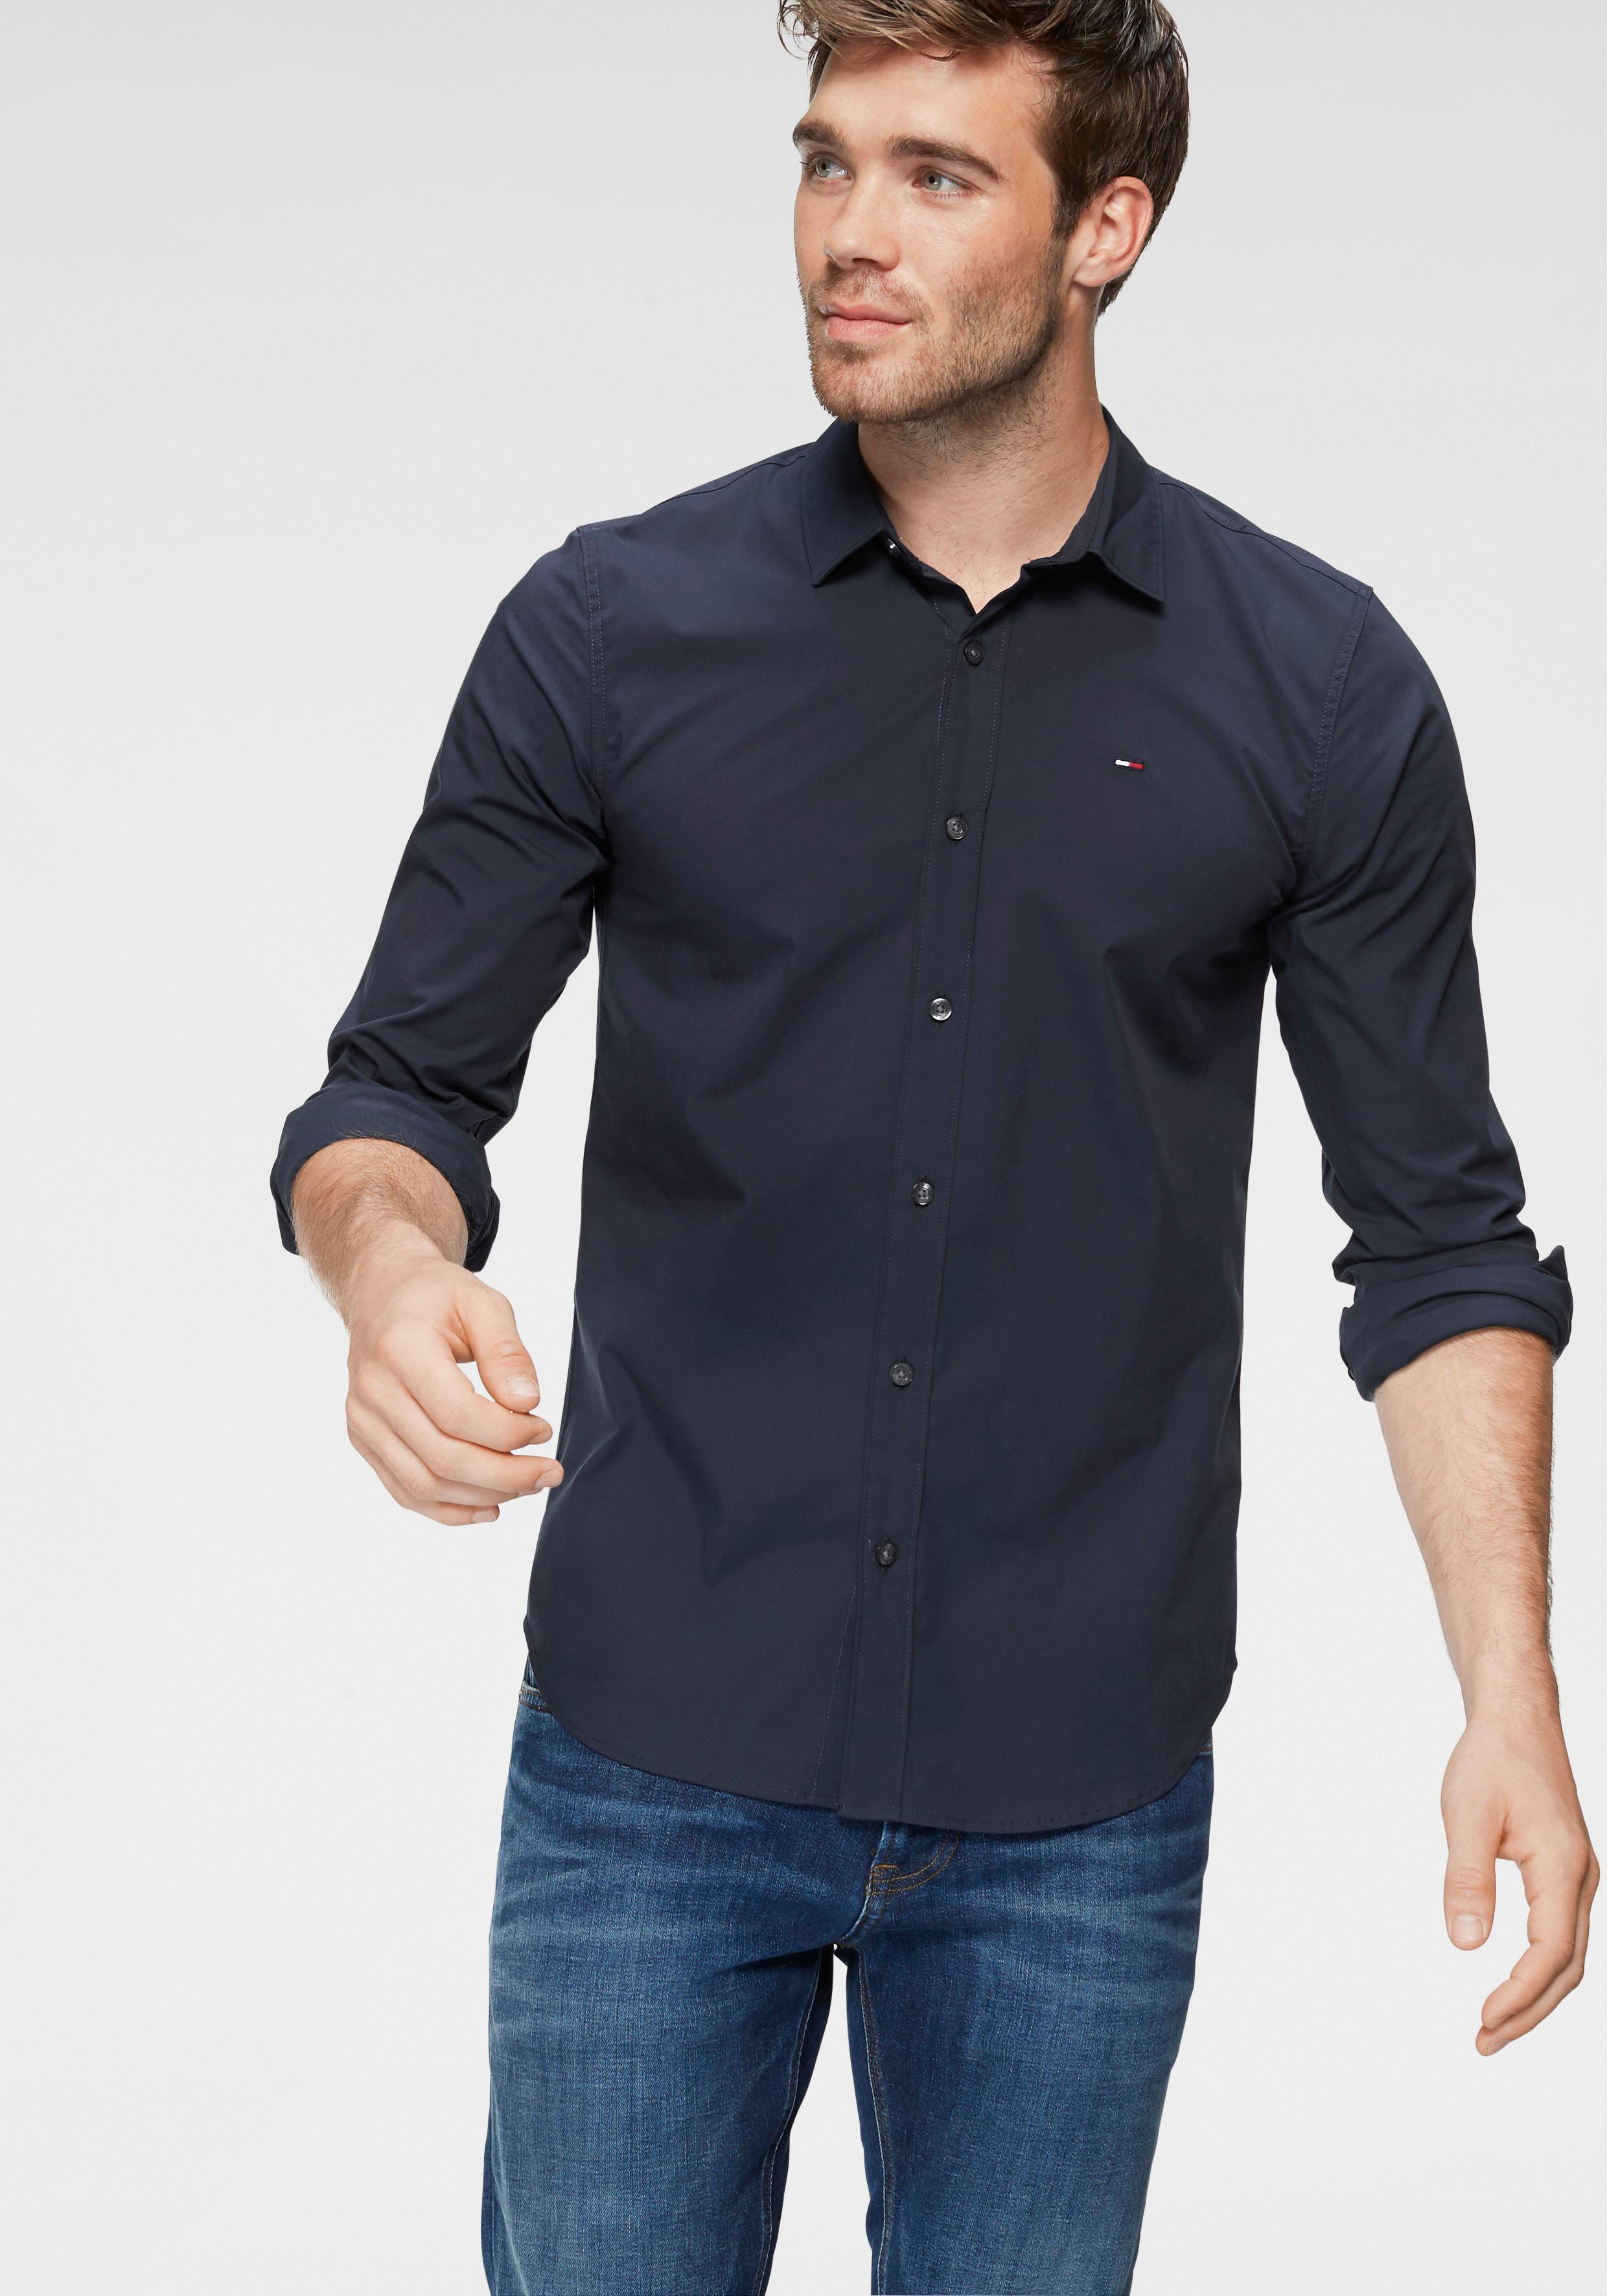 TOMMY JEANS Hemd Sabim Shirt | Bekleidung > Shirts > Sonstige Shirts | Blau | Tommy Jeans